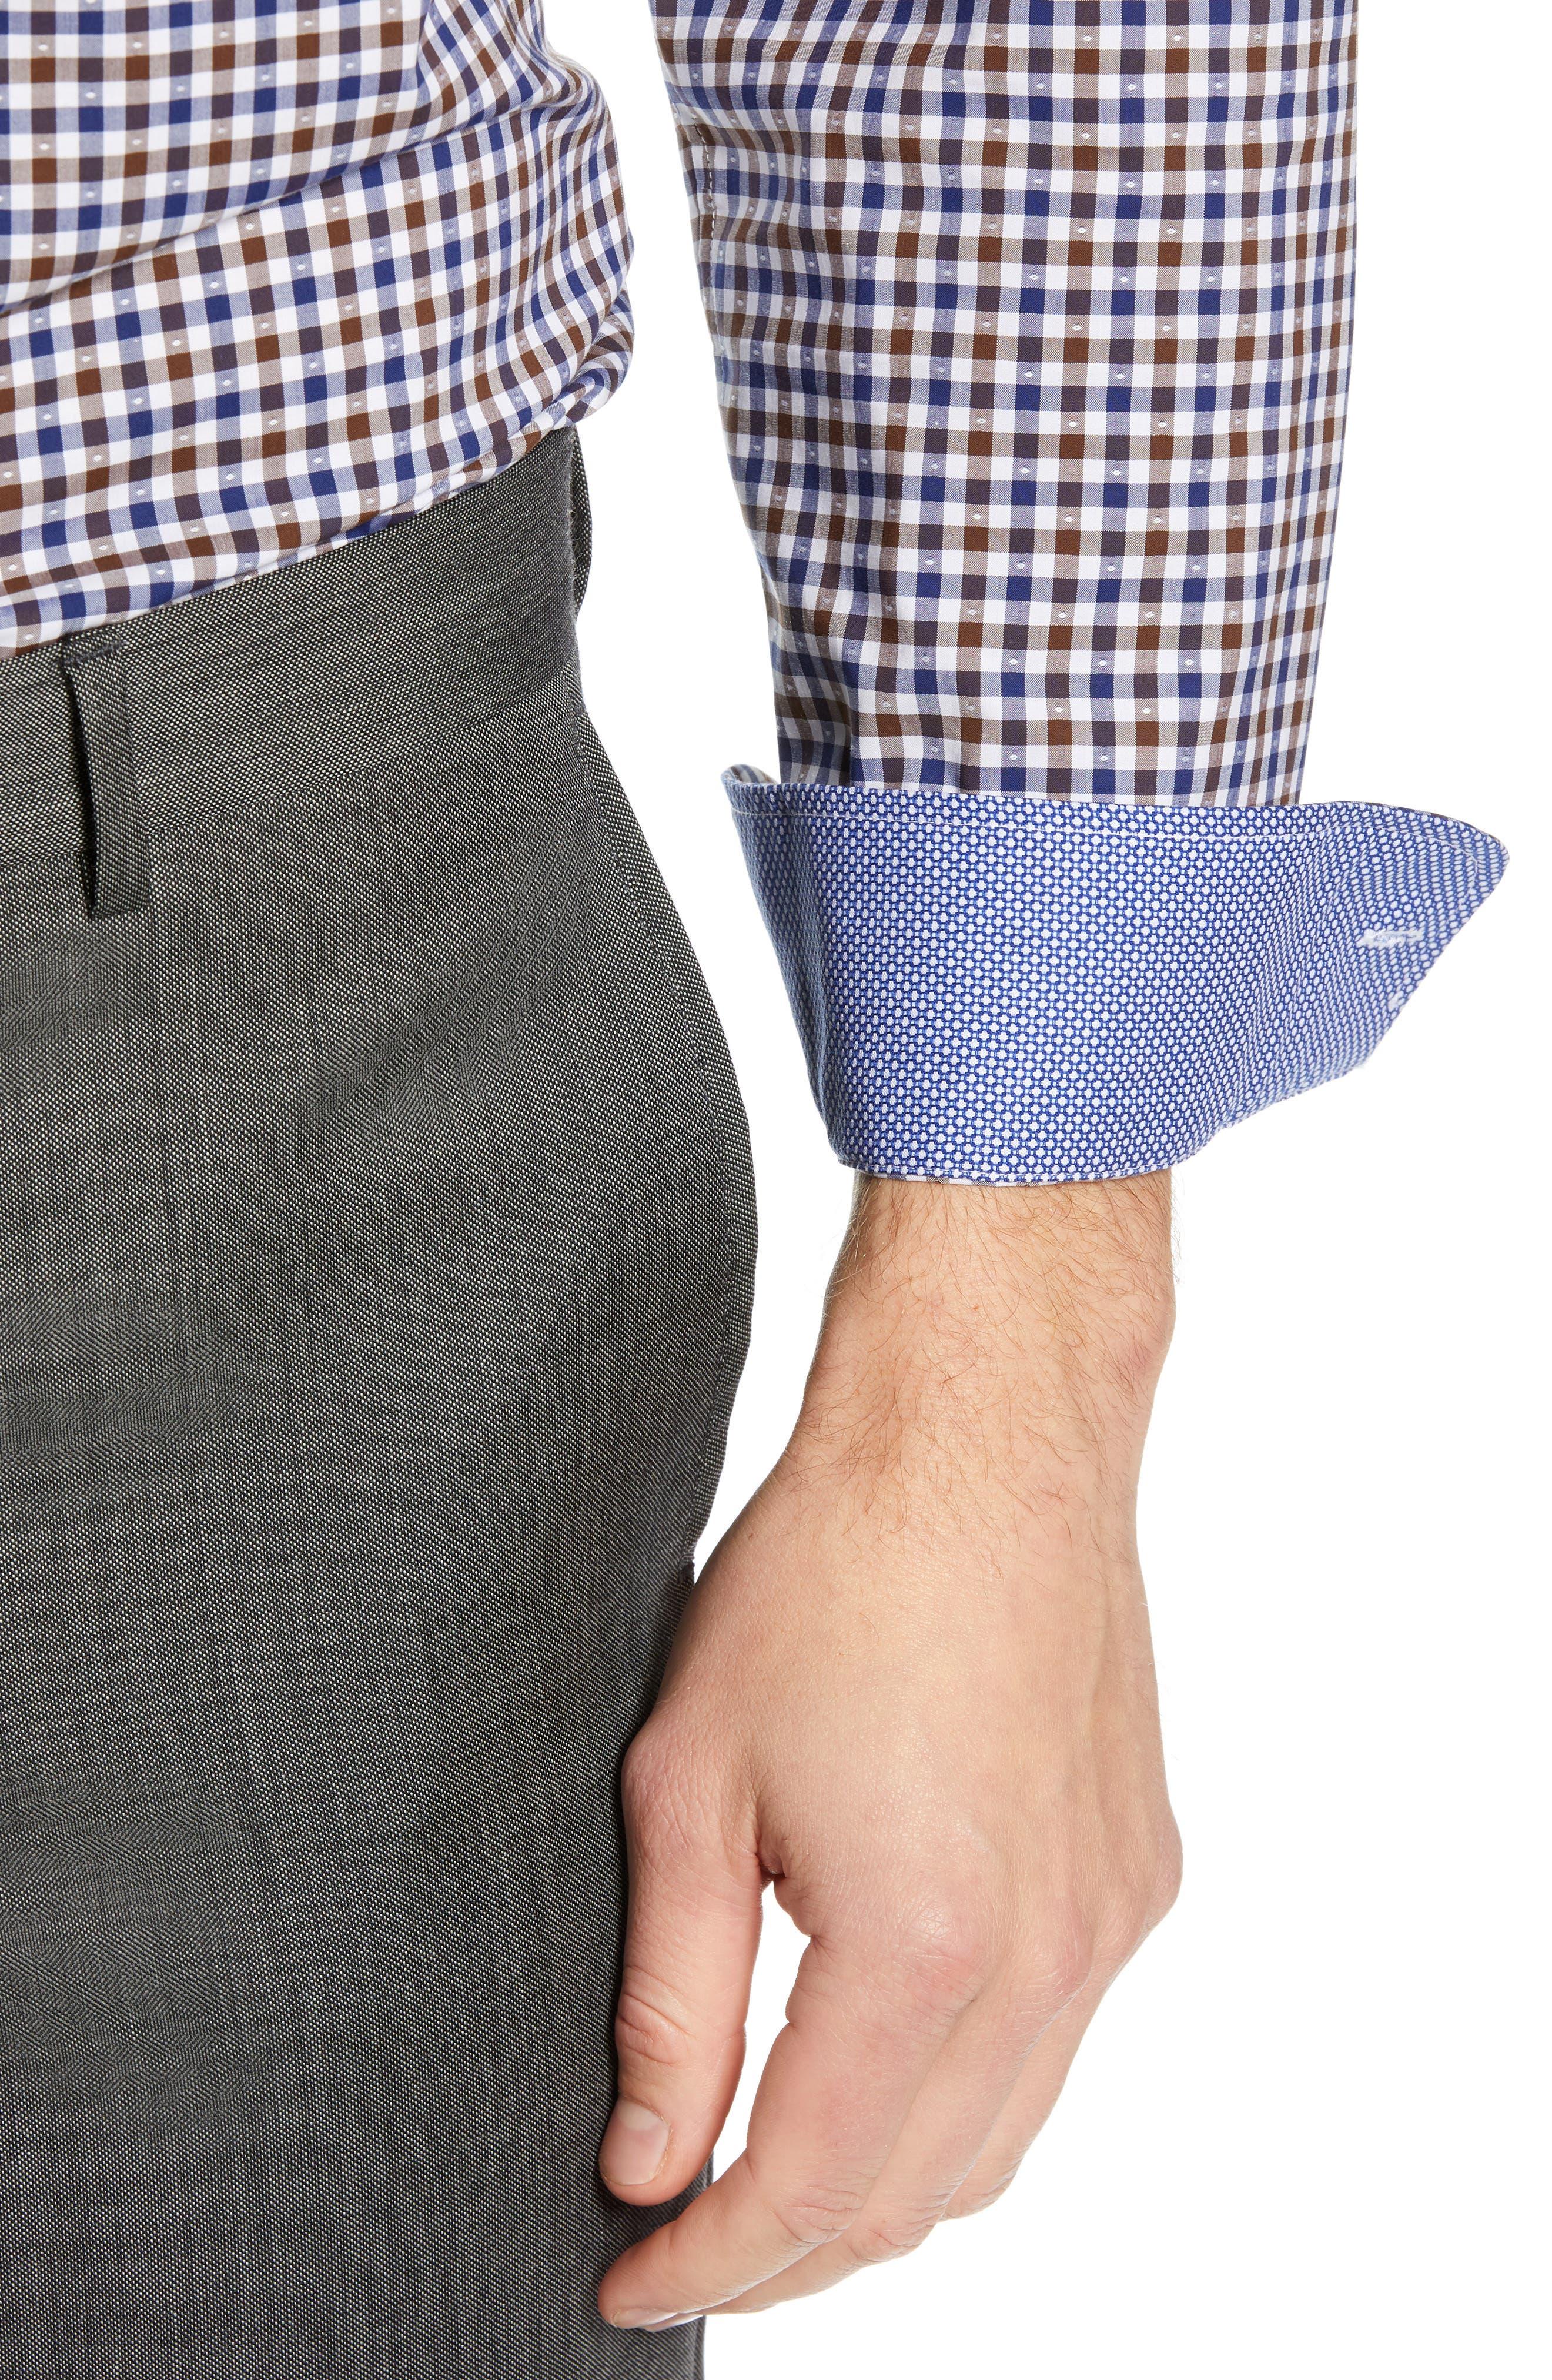 NORDSTROM MEN'S SHOP,                             Trim Fit Non-Iron Check Dress Shirt,                             Alternate thumbnail 2, color,                             BROWN FAWN